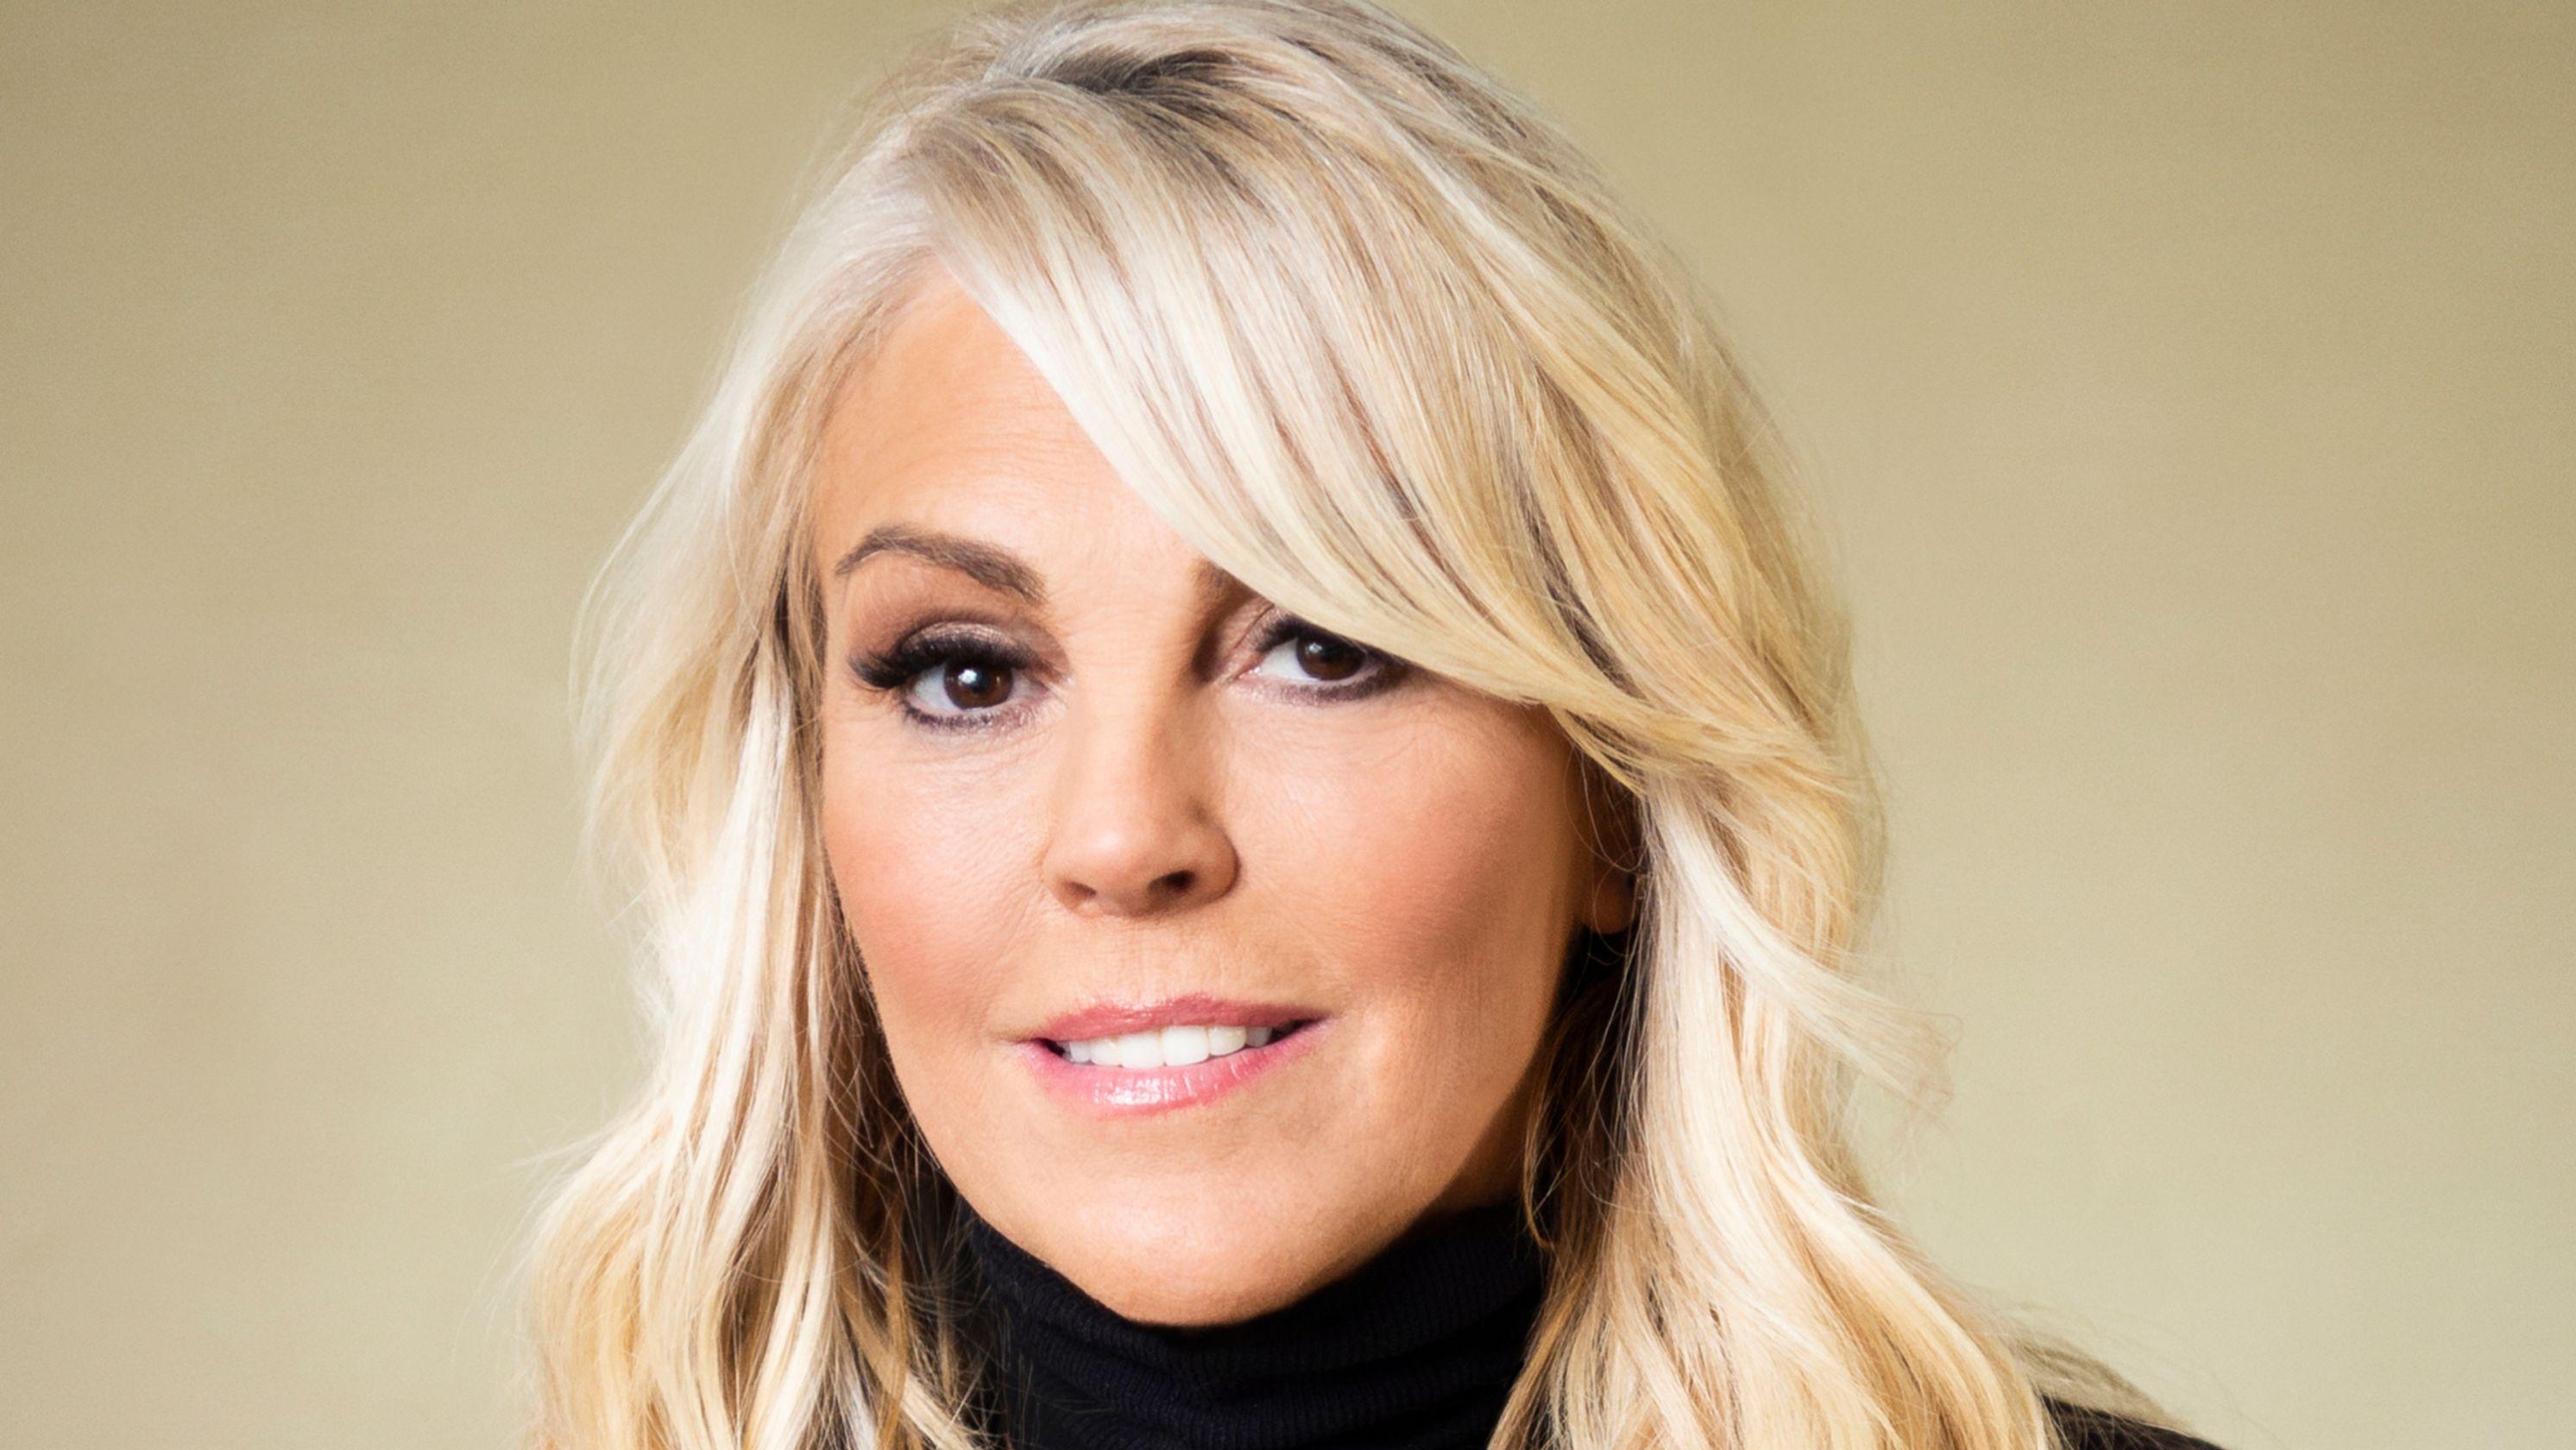 'Celebrity Big Brother 2' Alum Dina Lohan's Friend Is Not